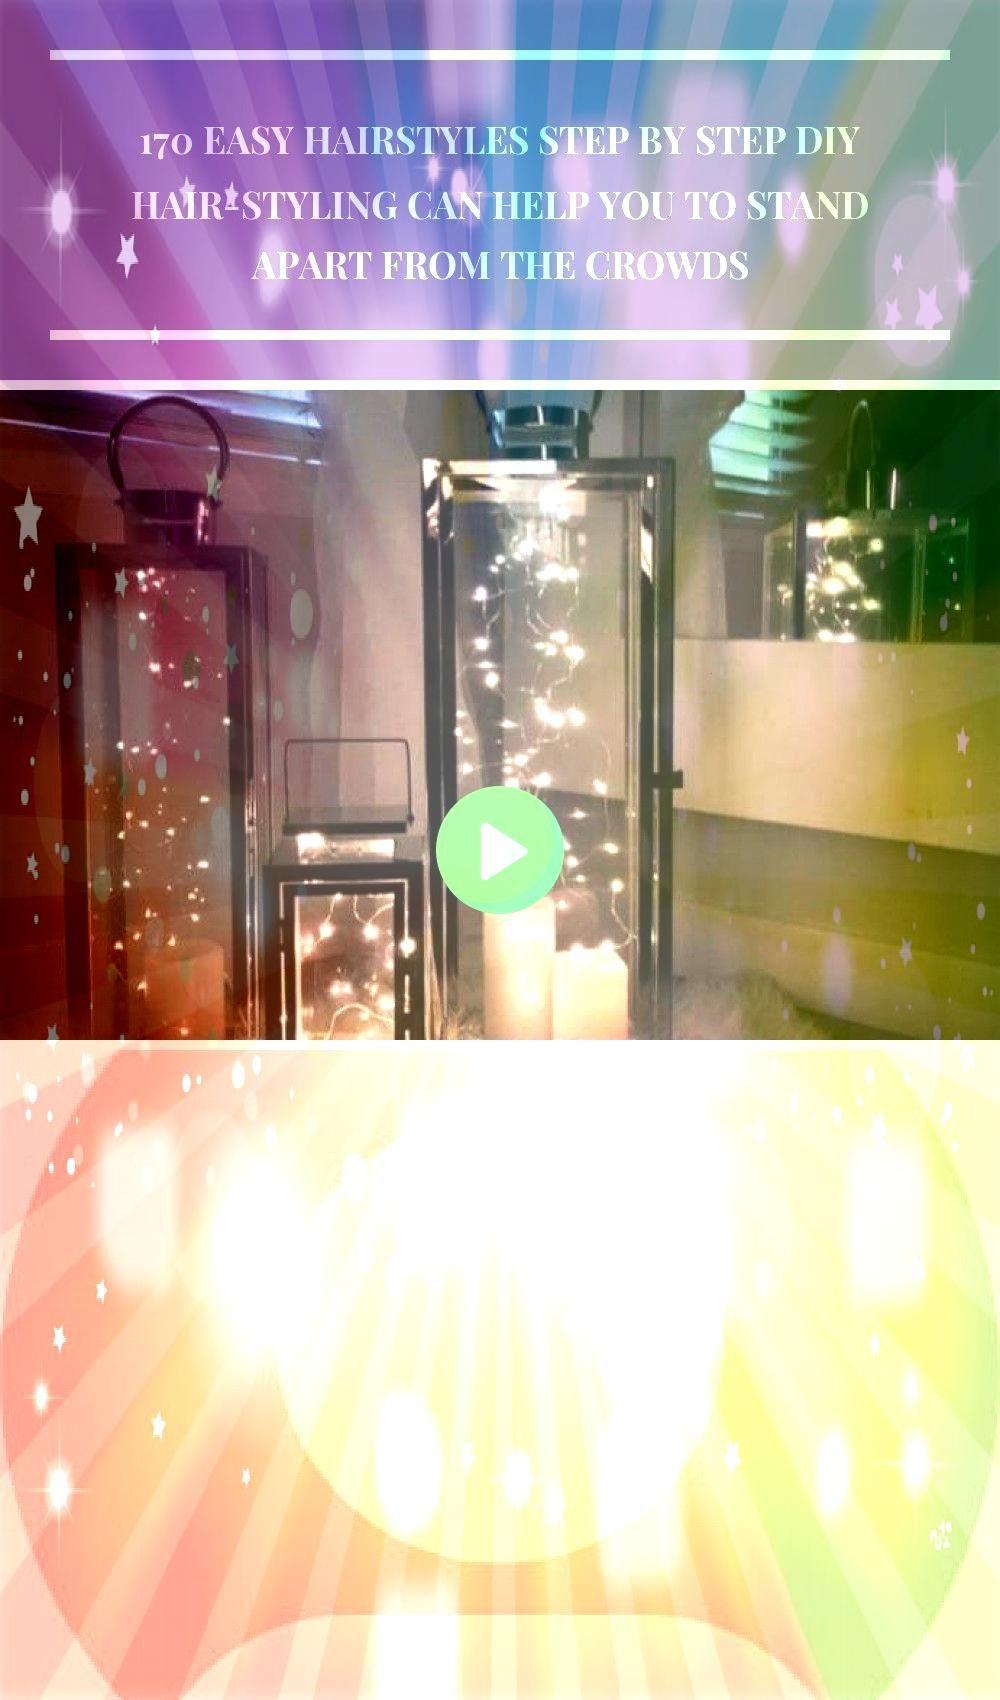 und Armaturen  Diy Living Room  diy hair styleBeleuchtung und Armaturen  Diy Living Room  diy hair style My Dressing Room Plan W83376CL Photo Gallery Luxury Premium Colle...